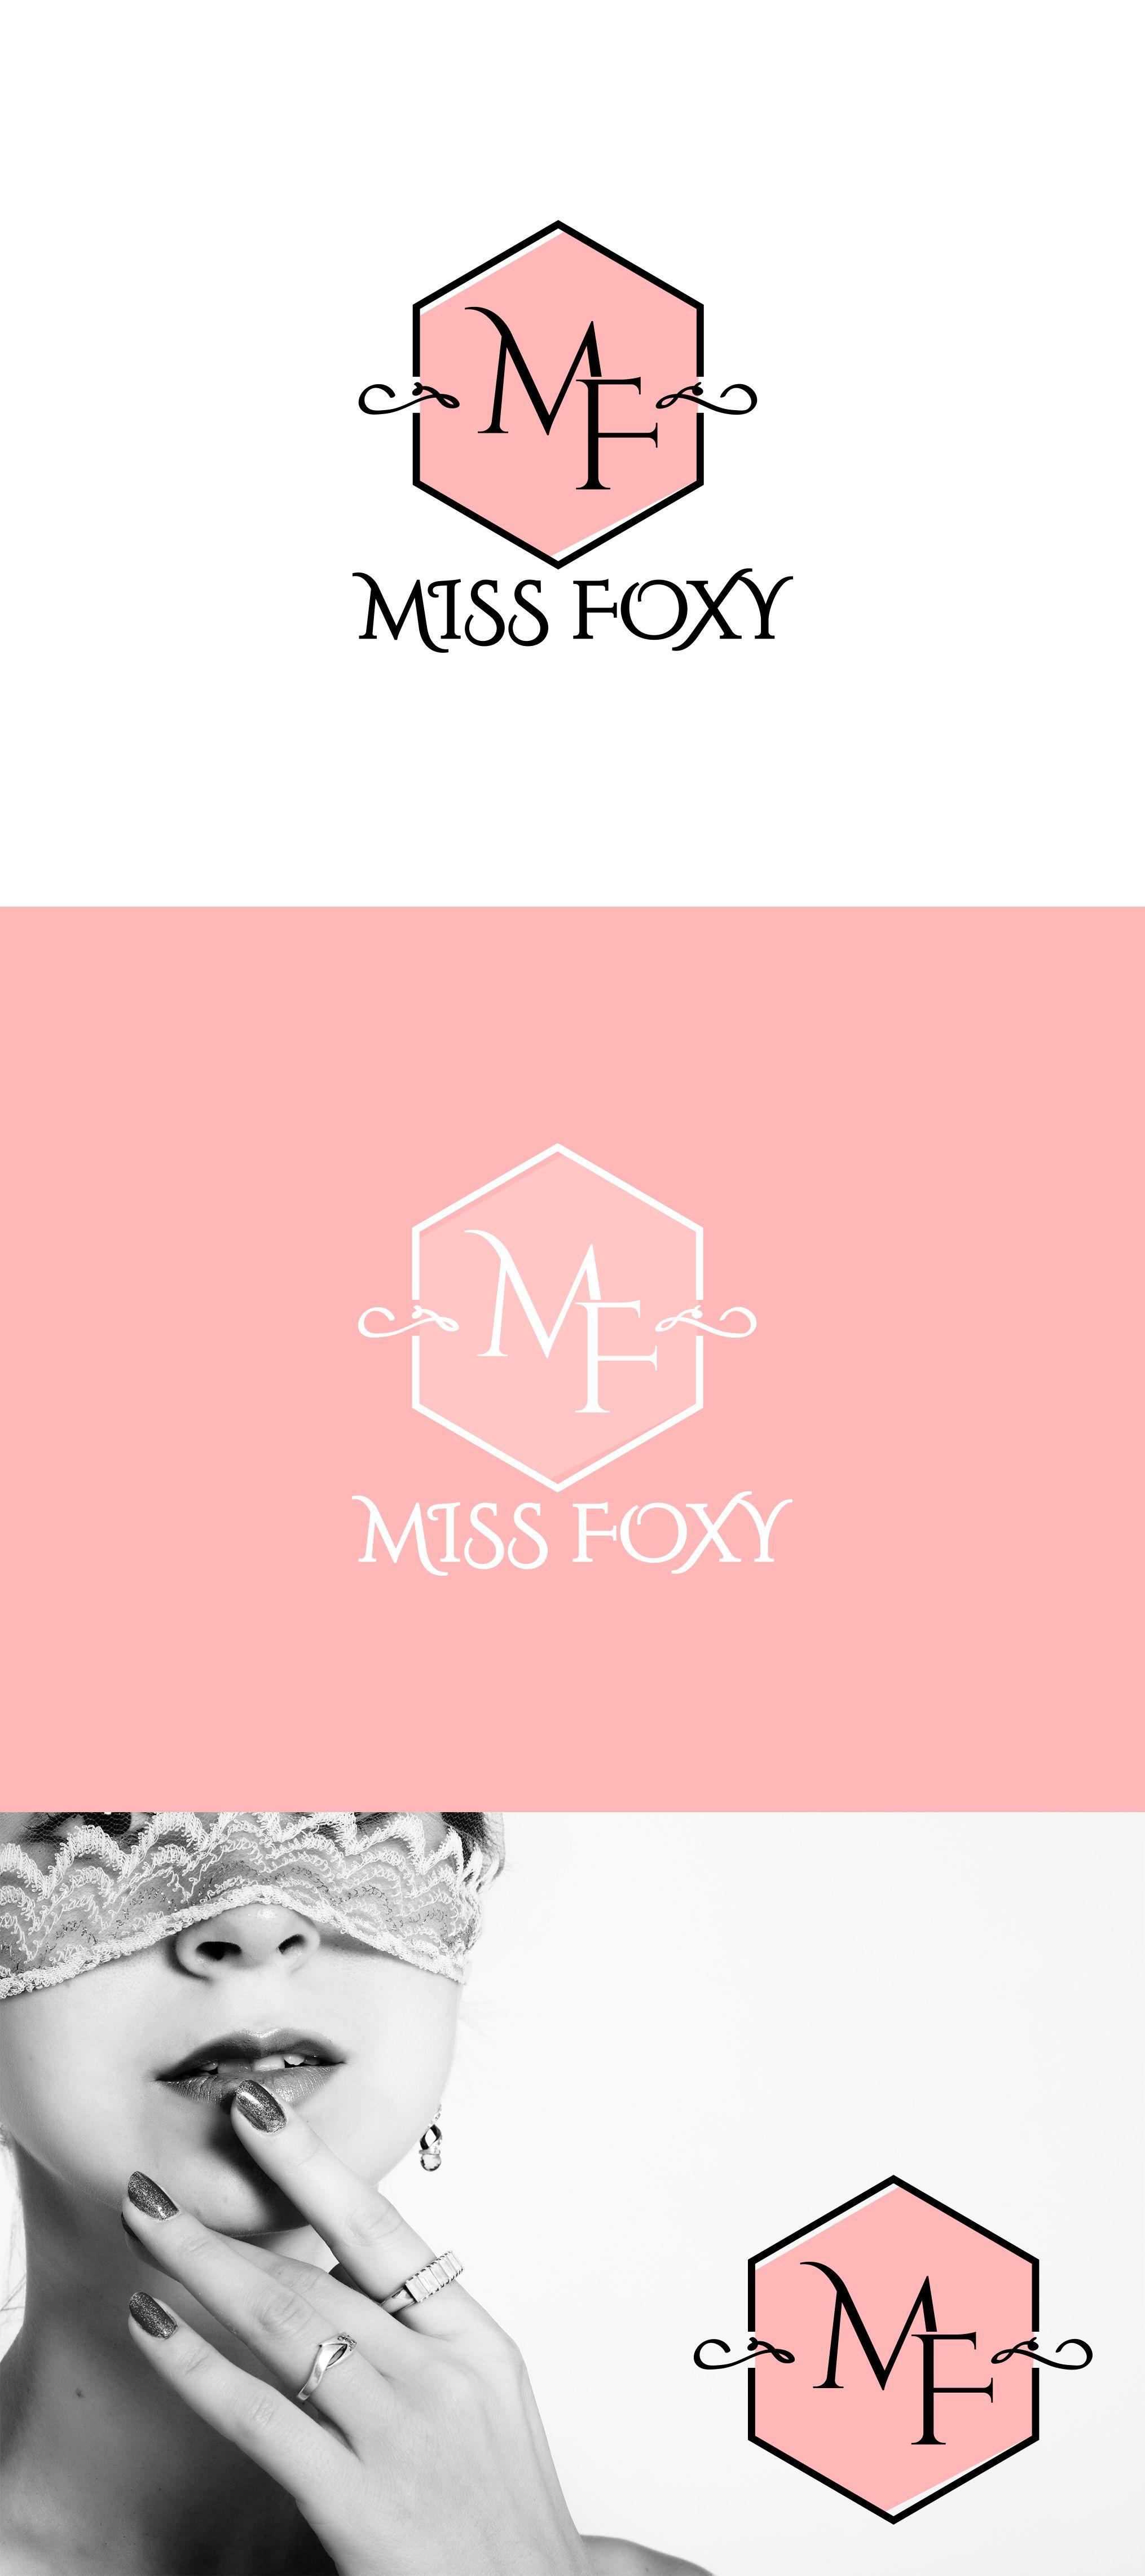 Nail Makeup Beautician Logo Design 99designs Contest Entry Unused Designed